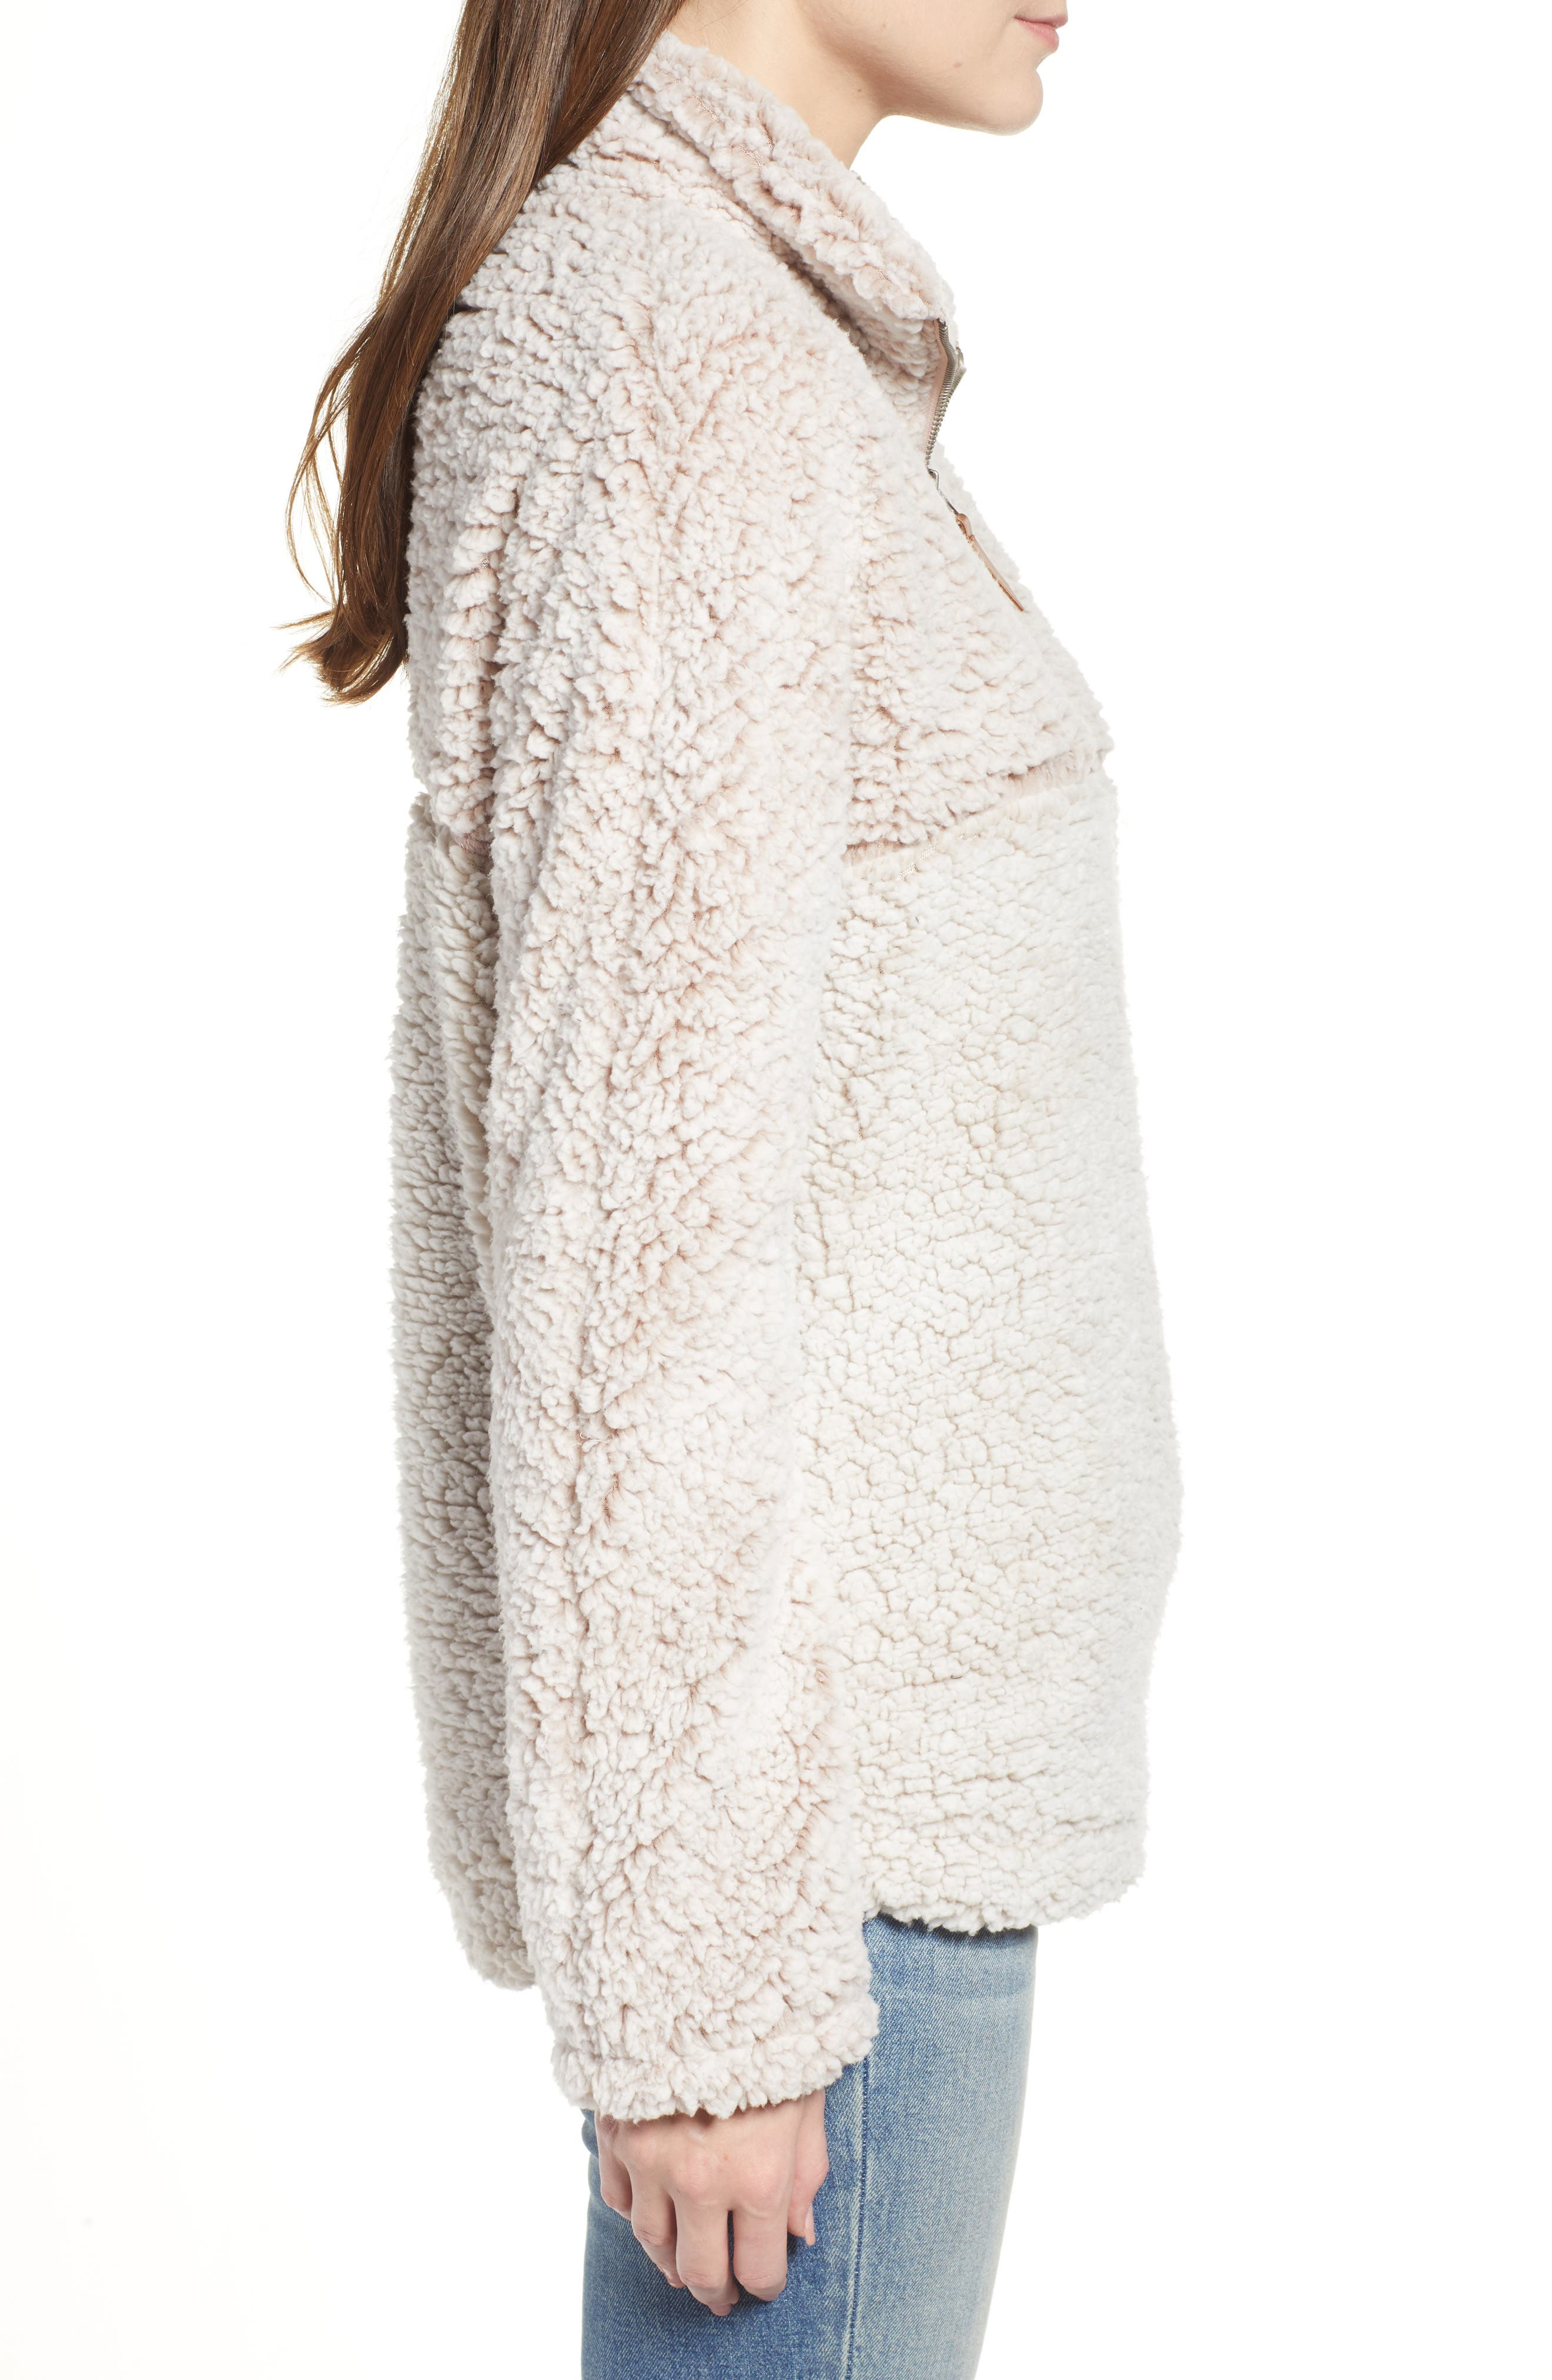 THREAD & SUPPLY, Colorblock Wubby Fleece Pullover, Alternate thumbnail 3, color, SMOKE ROSE IVORY